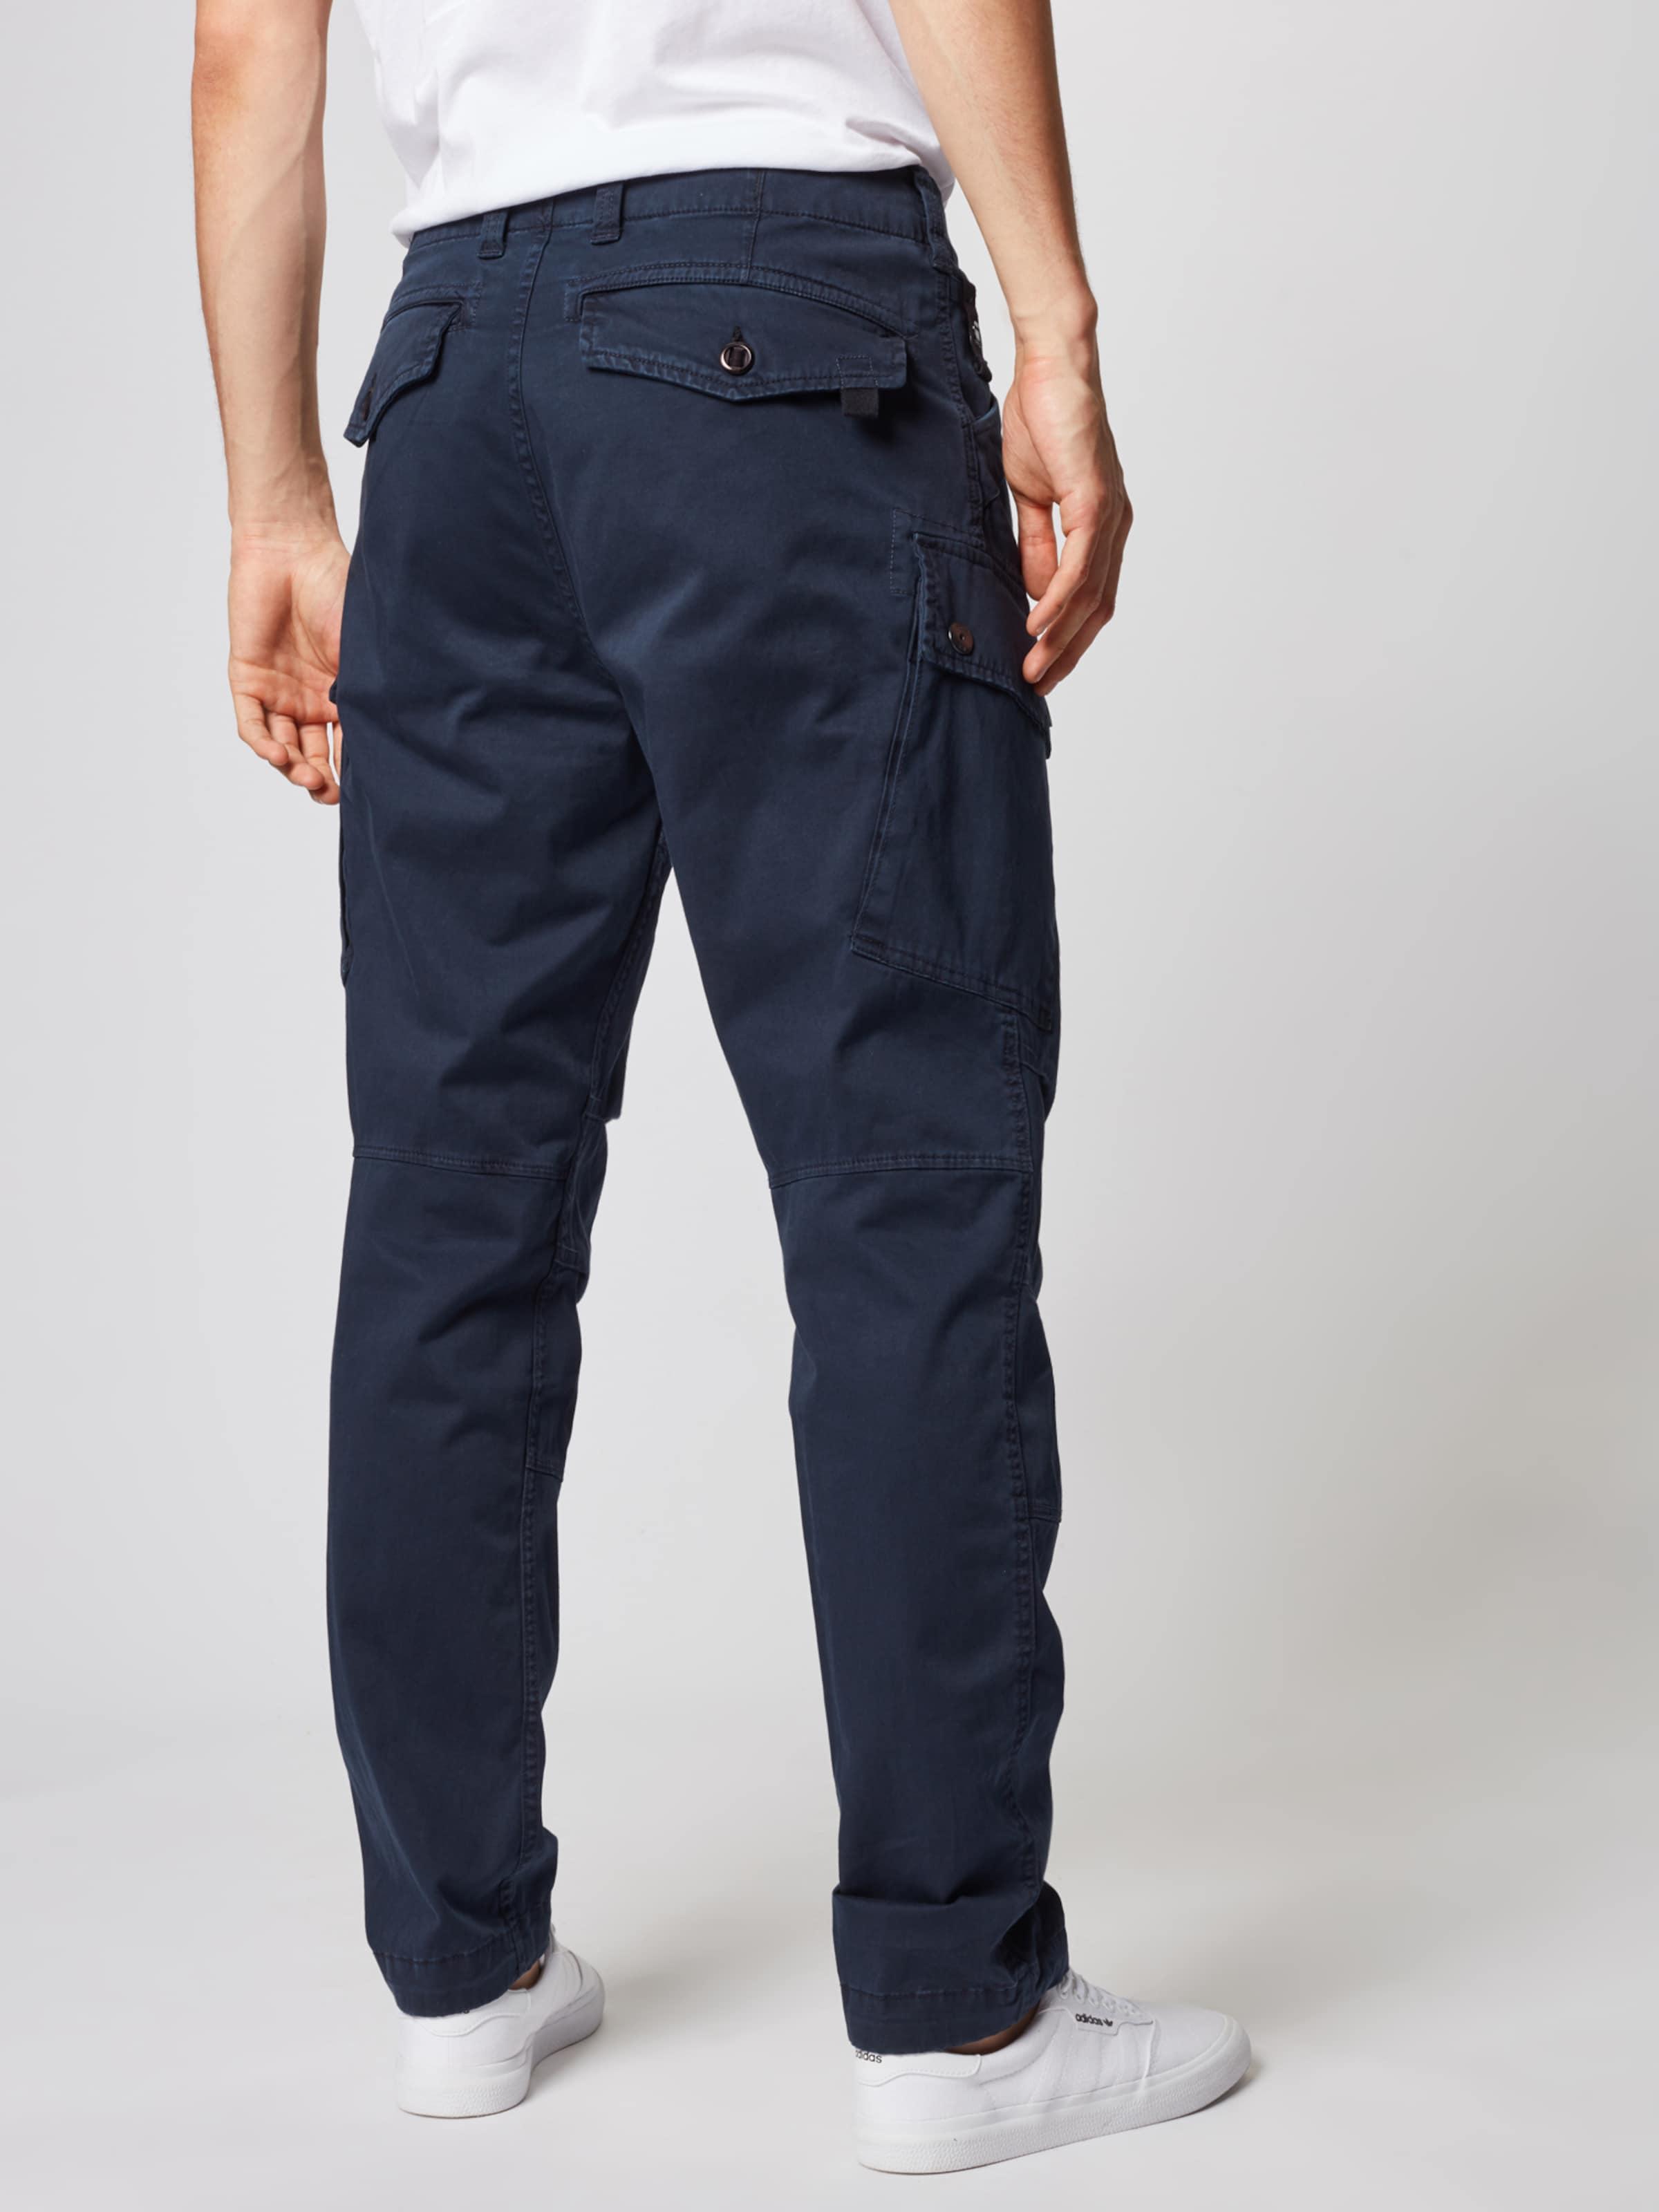 Raw Noir G 'roxic' En star Cargo Pantalon ZiTPukXO